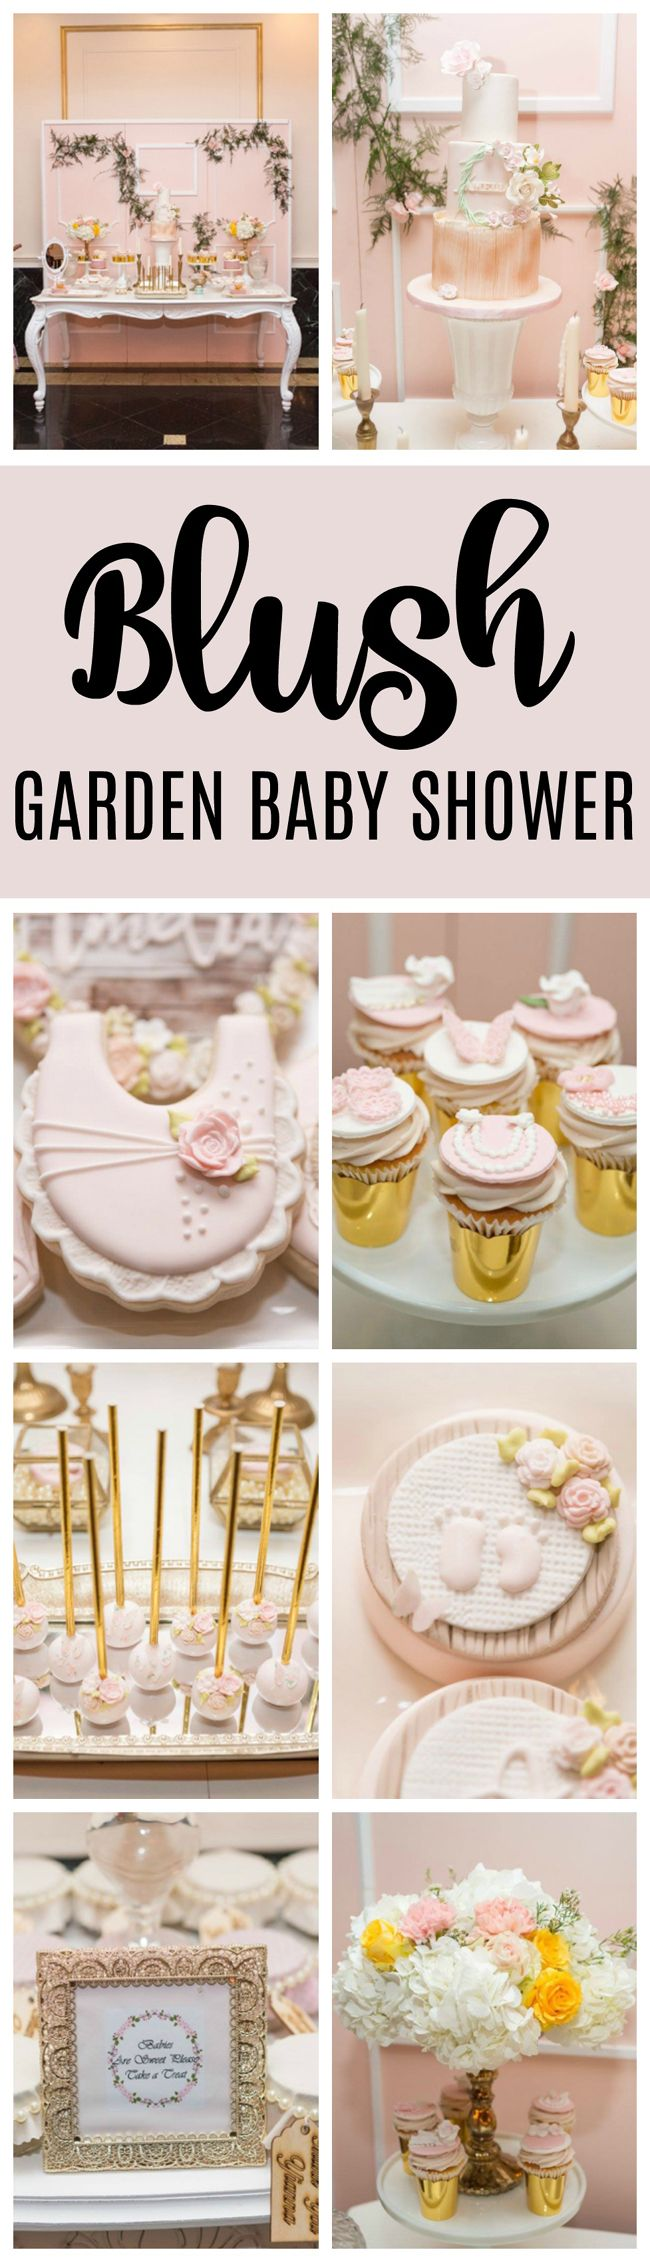 Blush Garden Themed Baby Shower - Pretty My Party #gardenbabyshower #gardenthemedbabyshower #babyshowerideas #babygirlshower #pinkbabyshower